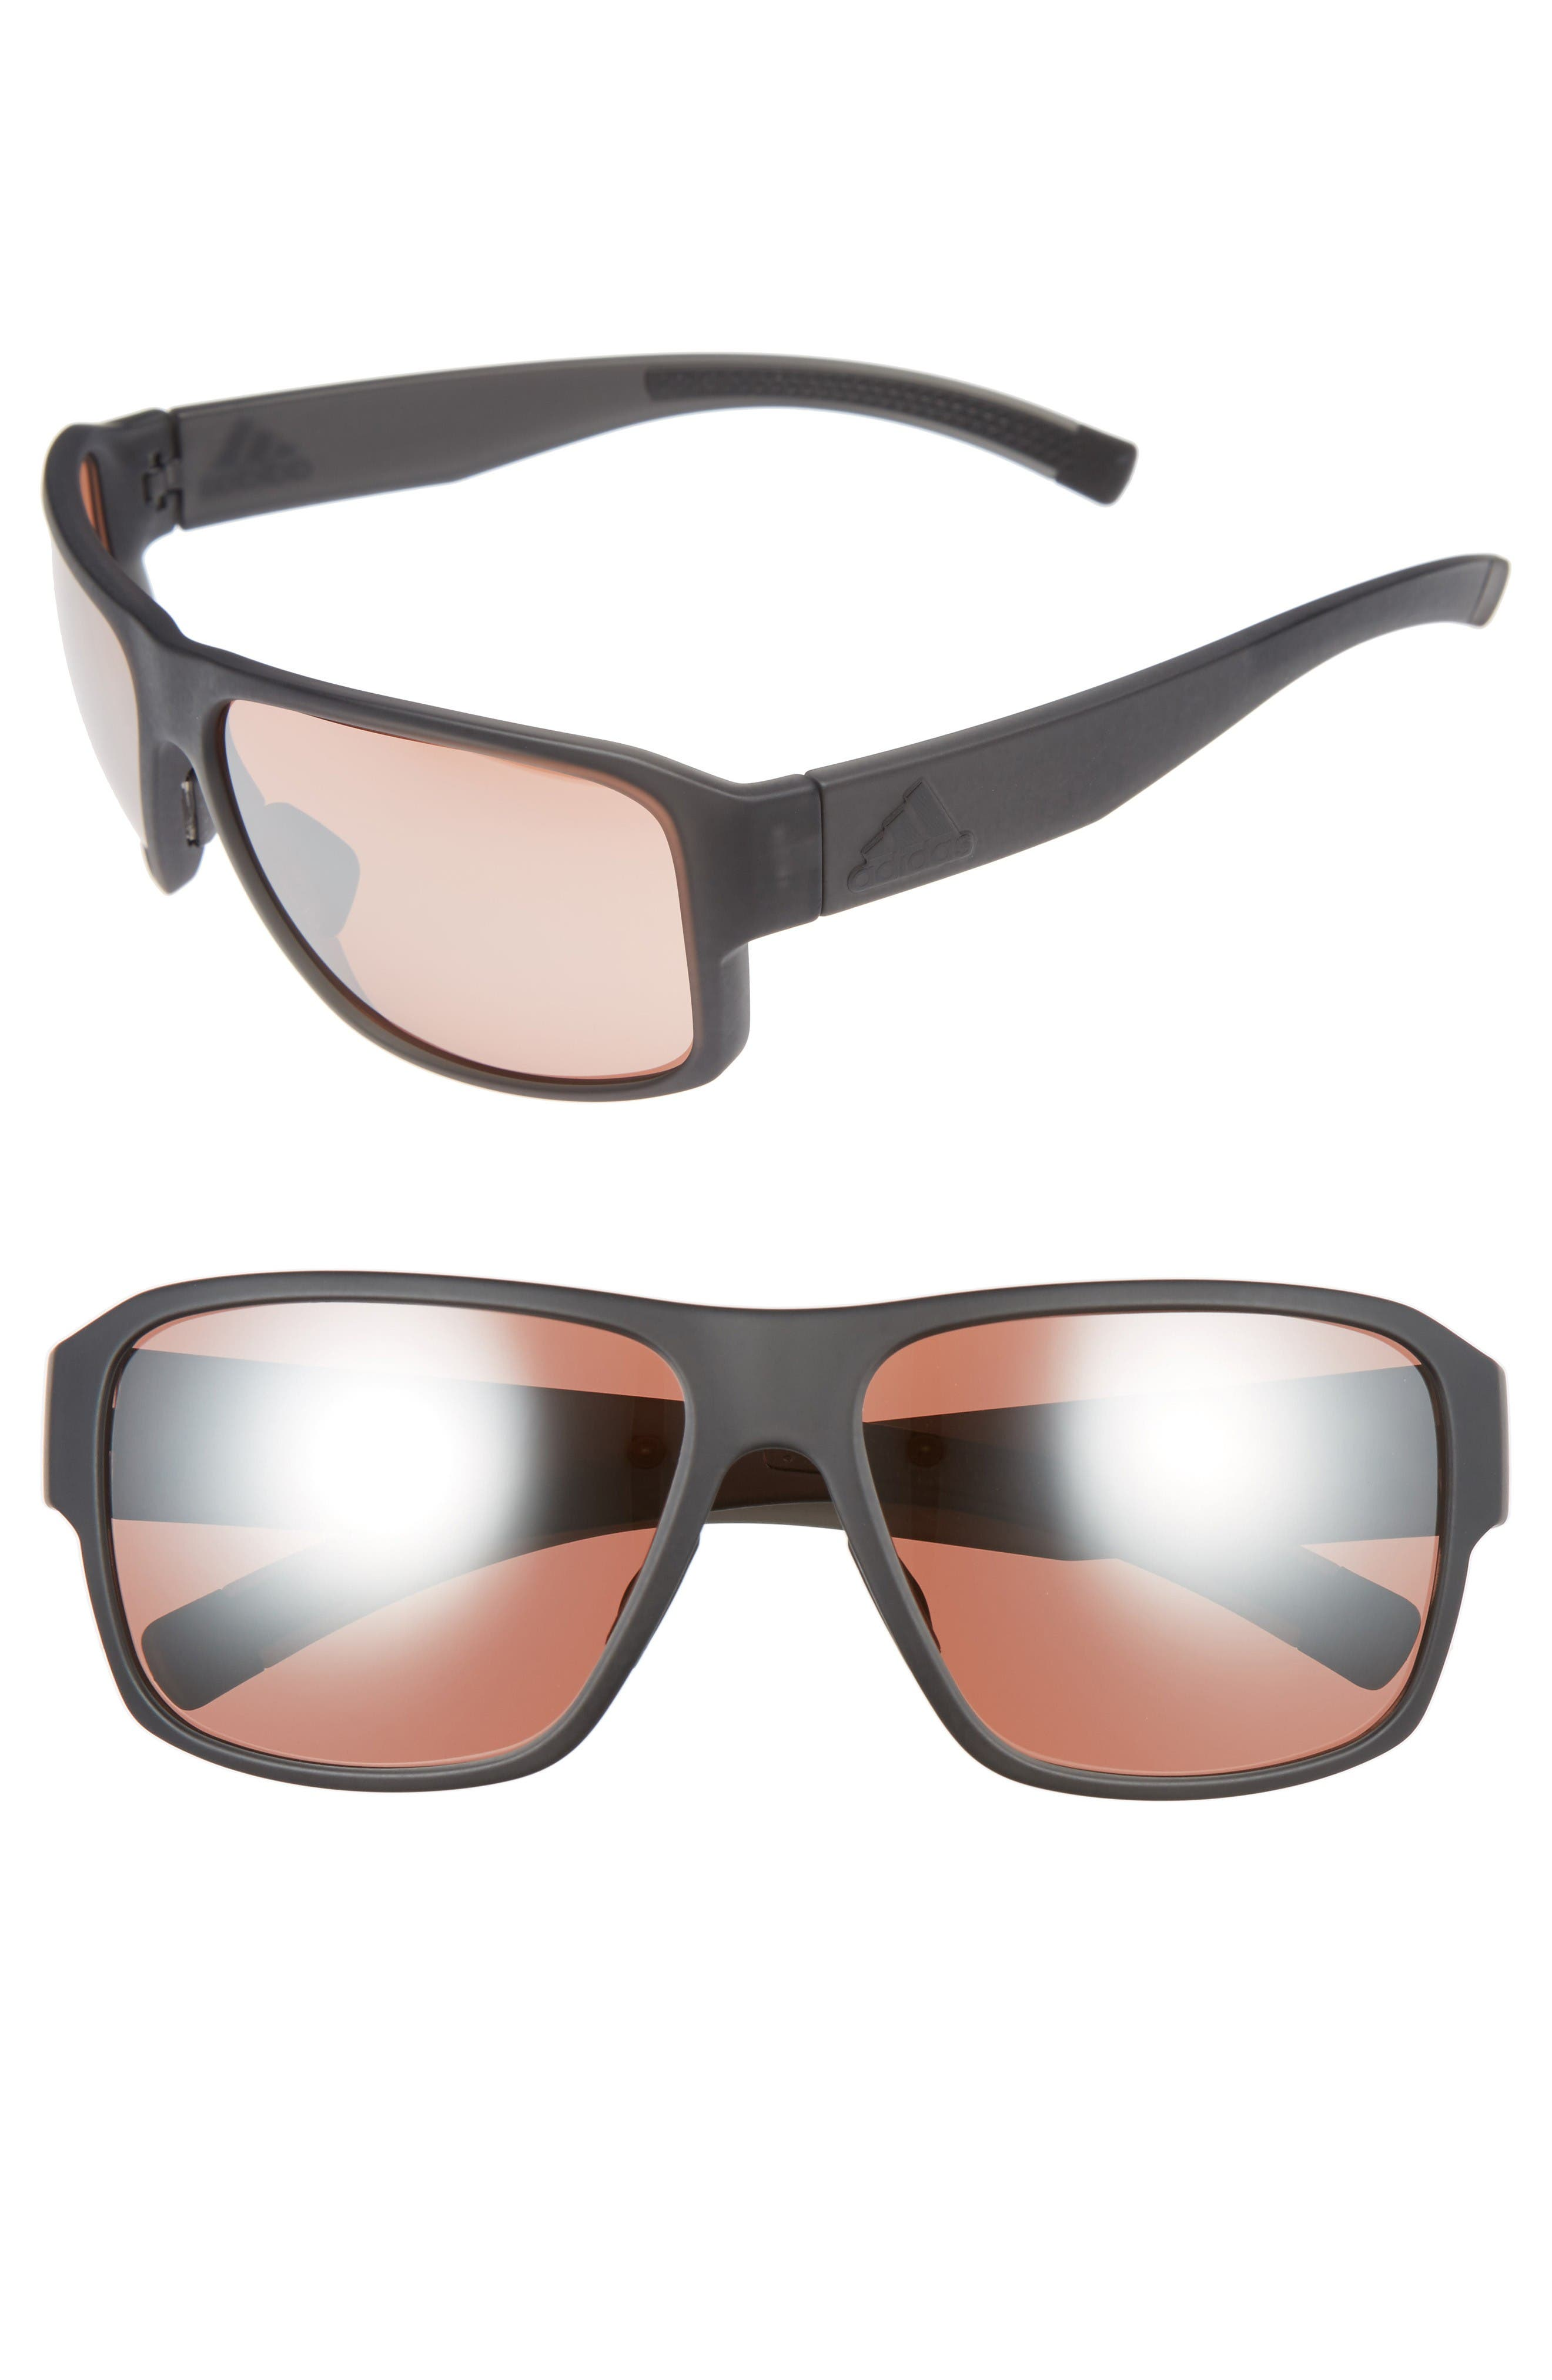 Jaysor 60mm Sunglasses,                         Main,                         color, Dark Grey Matte/ Taupe